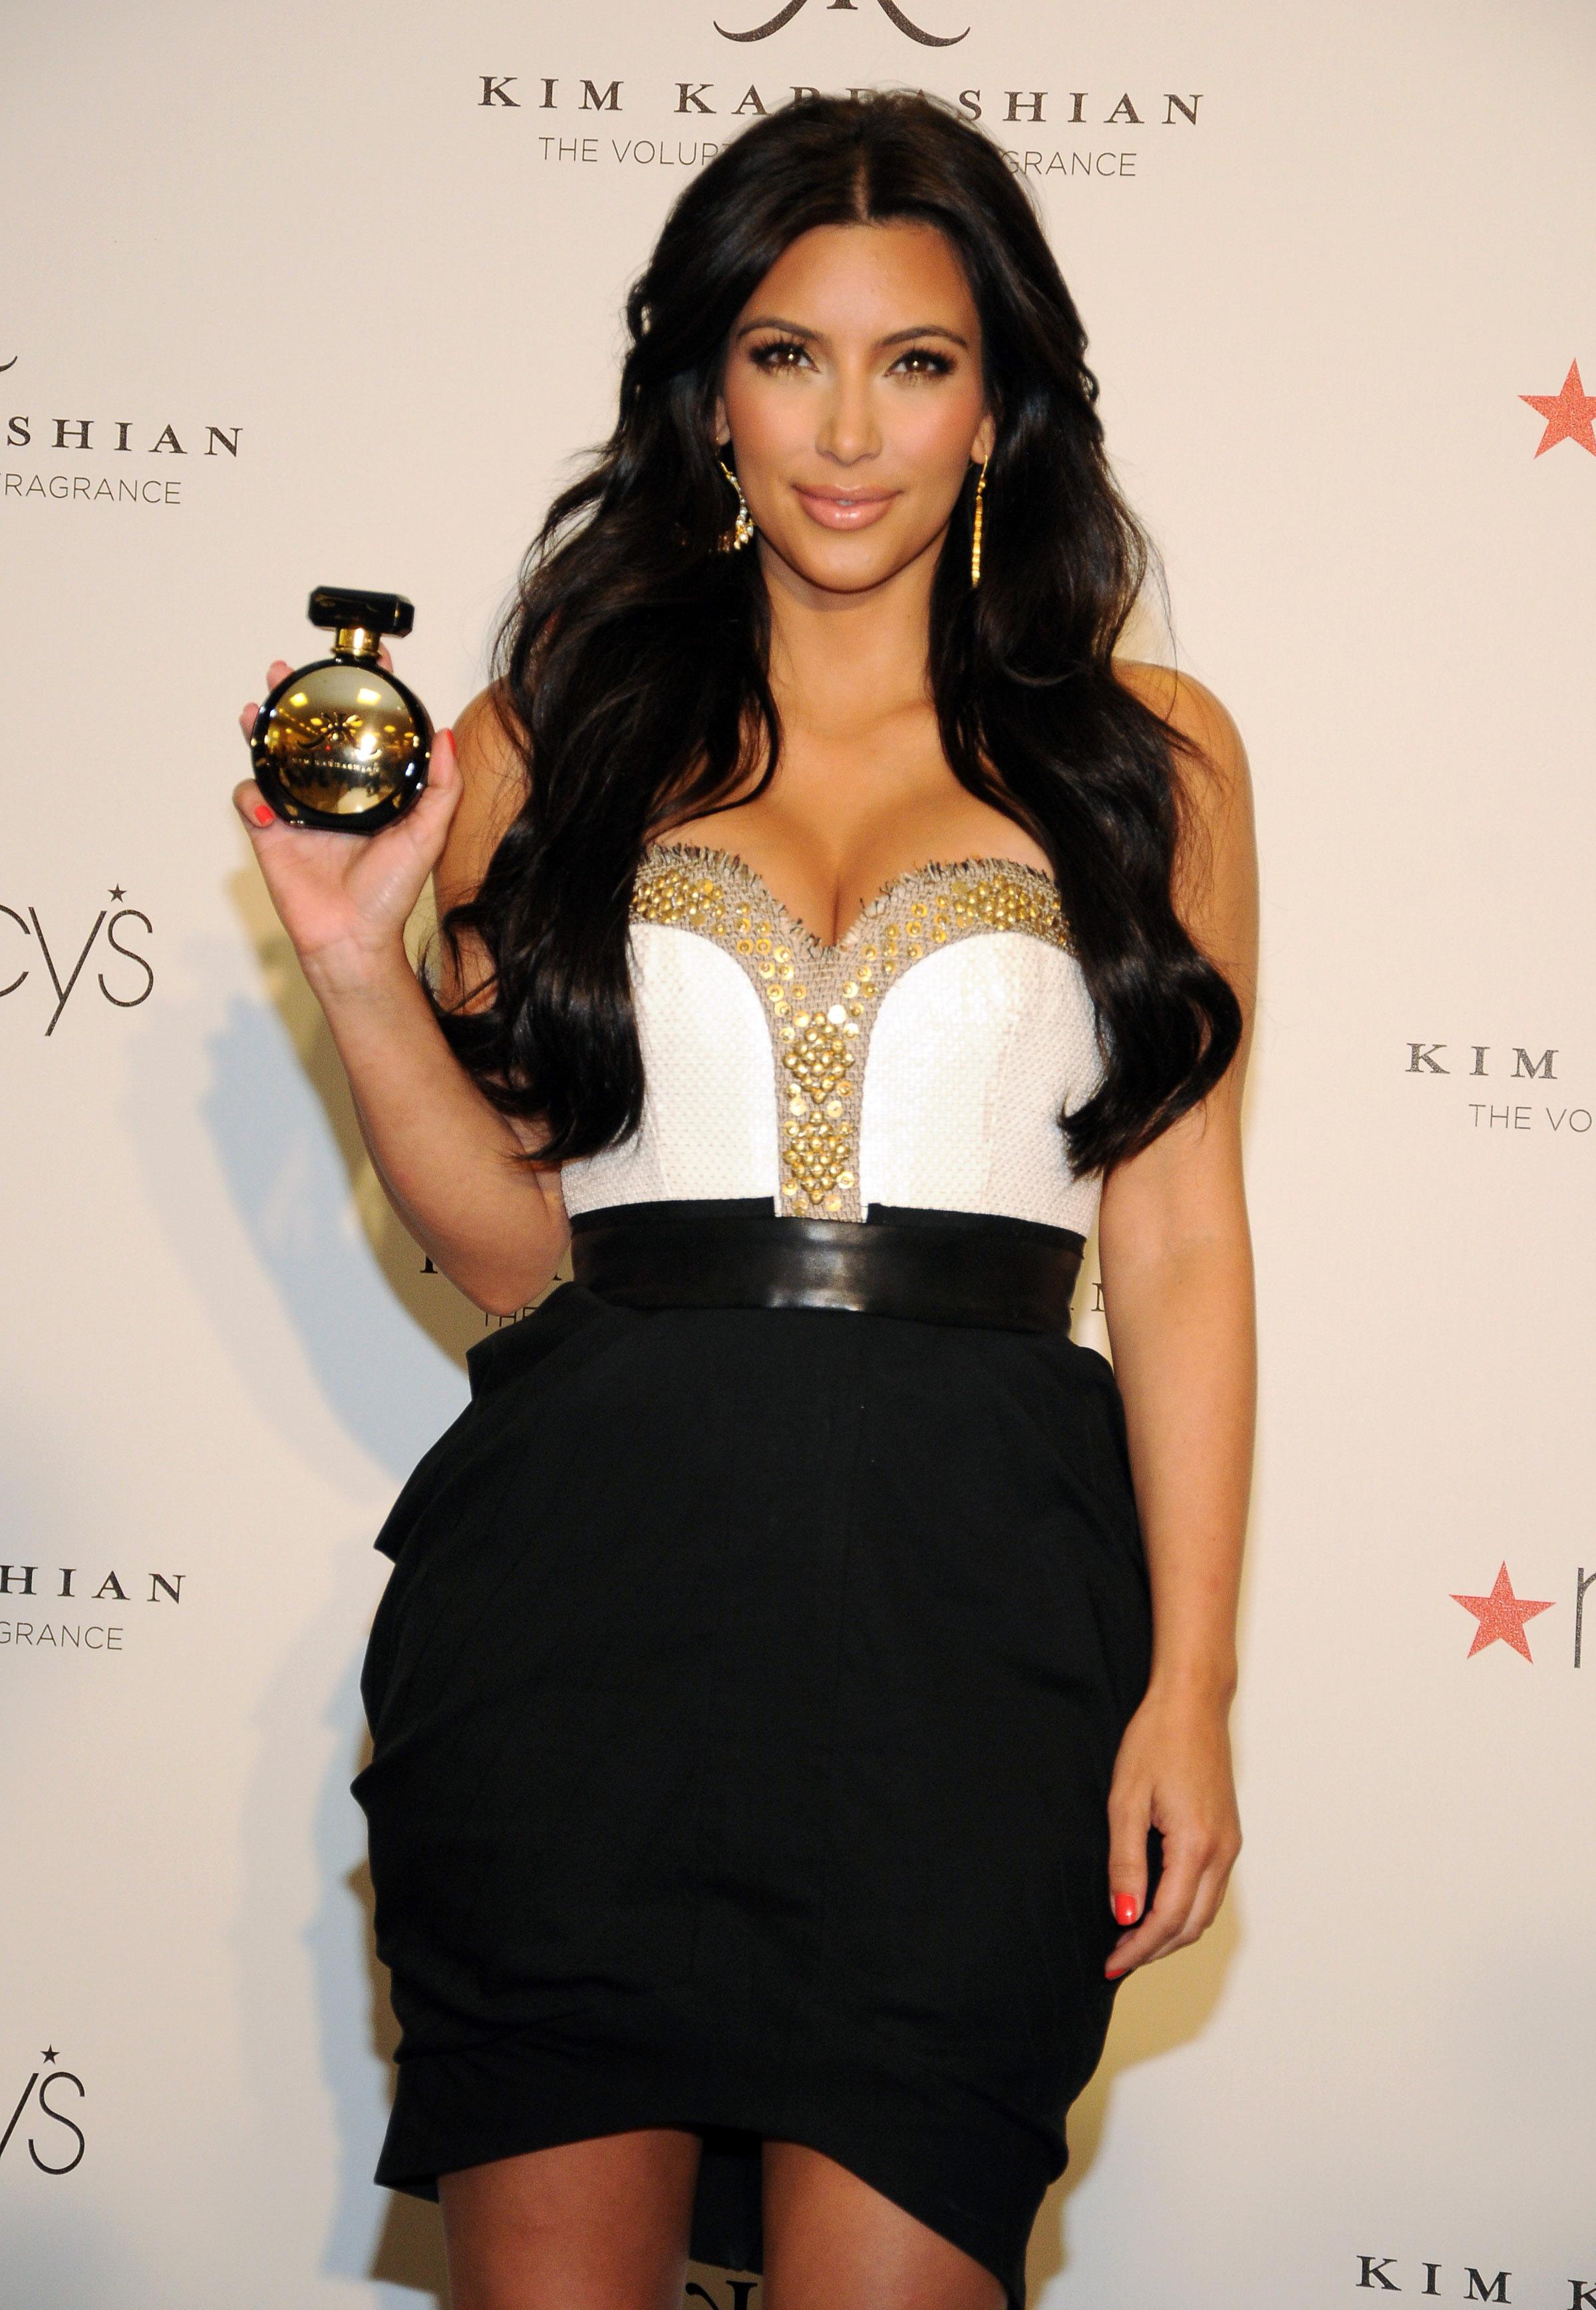 86612_celebrity_paradise.com_Kim_Kardashian_Fragance_63_122_183lo.jpg